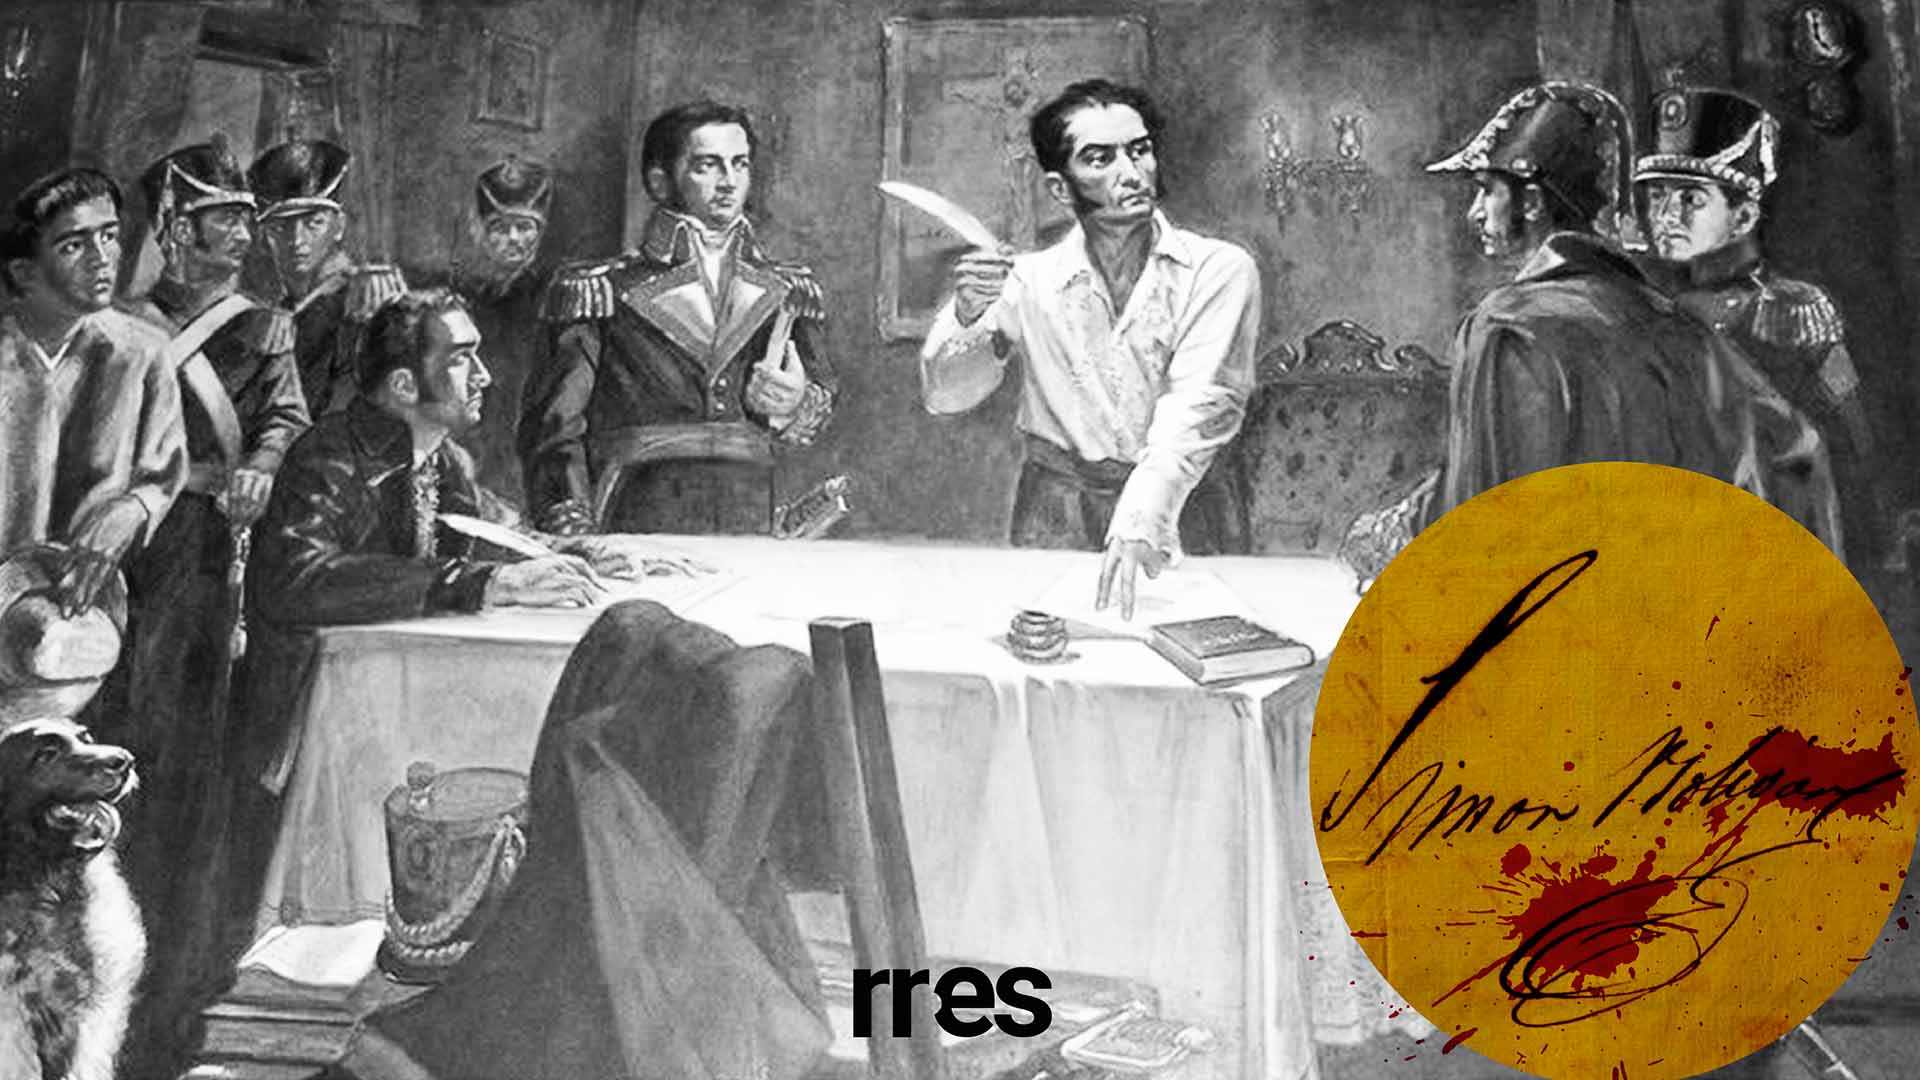 #10DocumentosBolivarianos   Proclama de Guerra a Muerte, o la insensatez de un holocausto, por Elías Pino Iturrieta